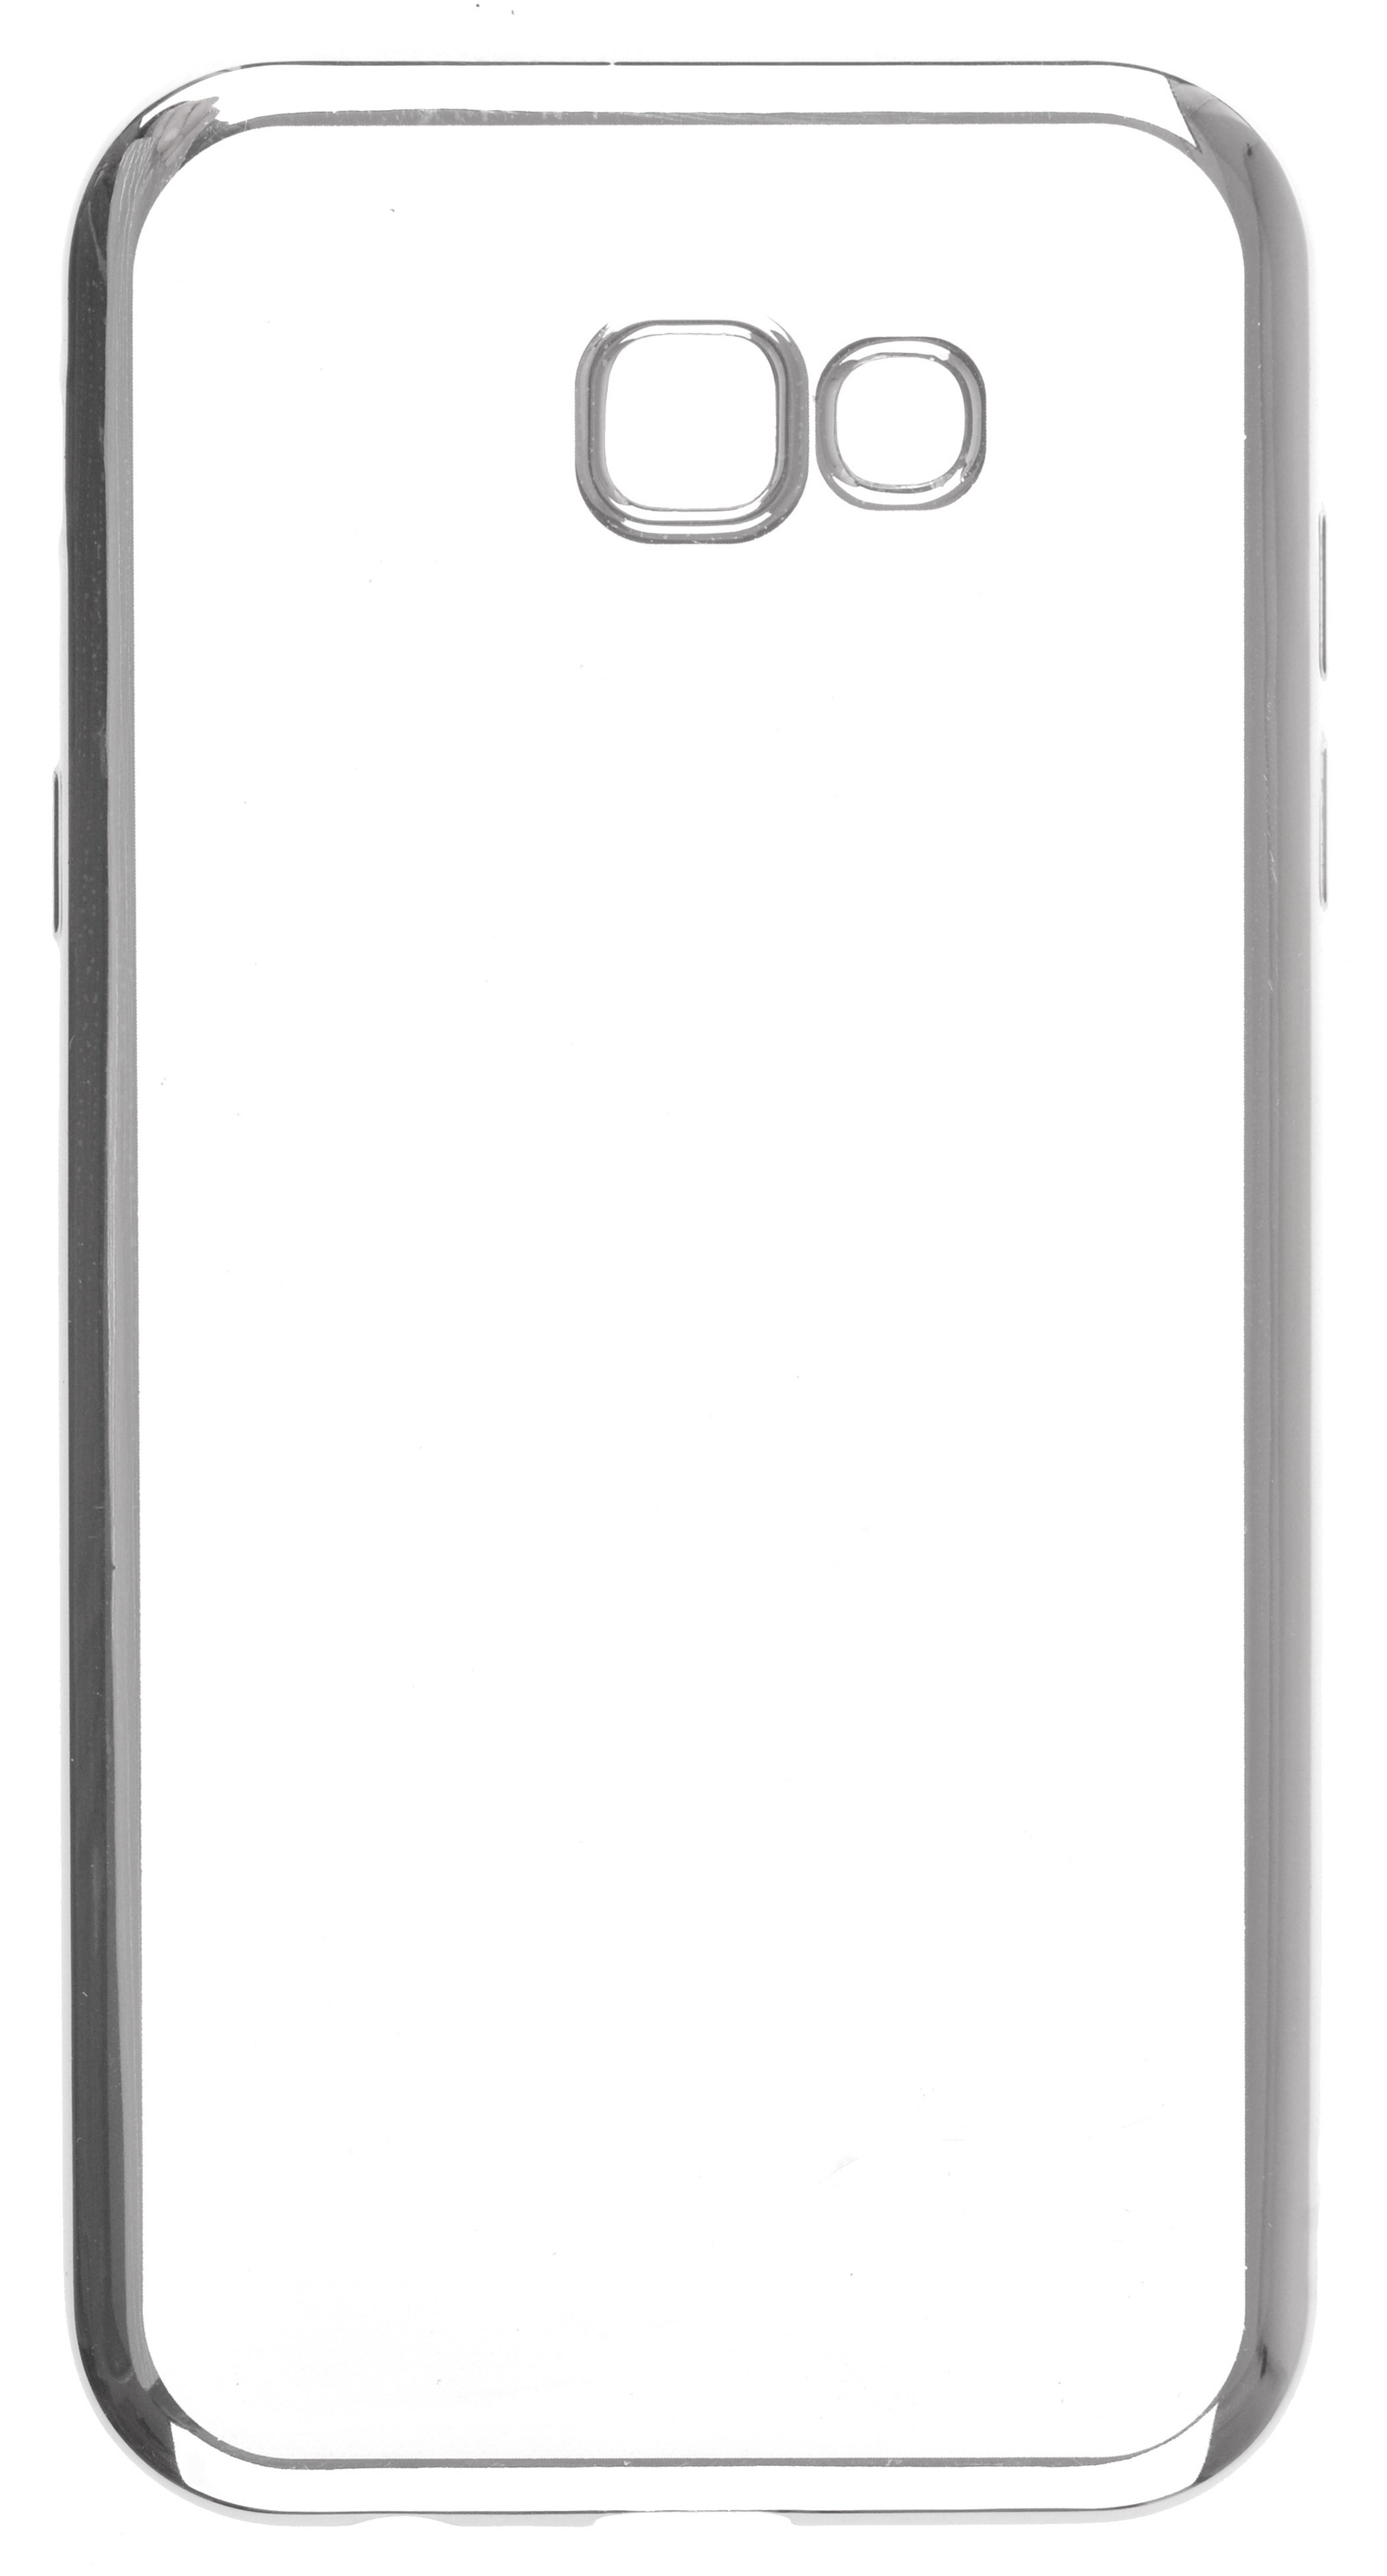 Чехол для сотового телефона skinBOX Silicone chrome border, 4630042524552, серебристый чехол для сотового телефона skinbox silicone chrome border 4630042524514 серебристый